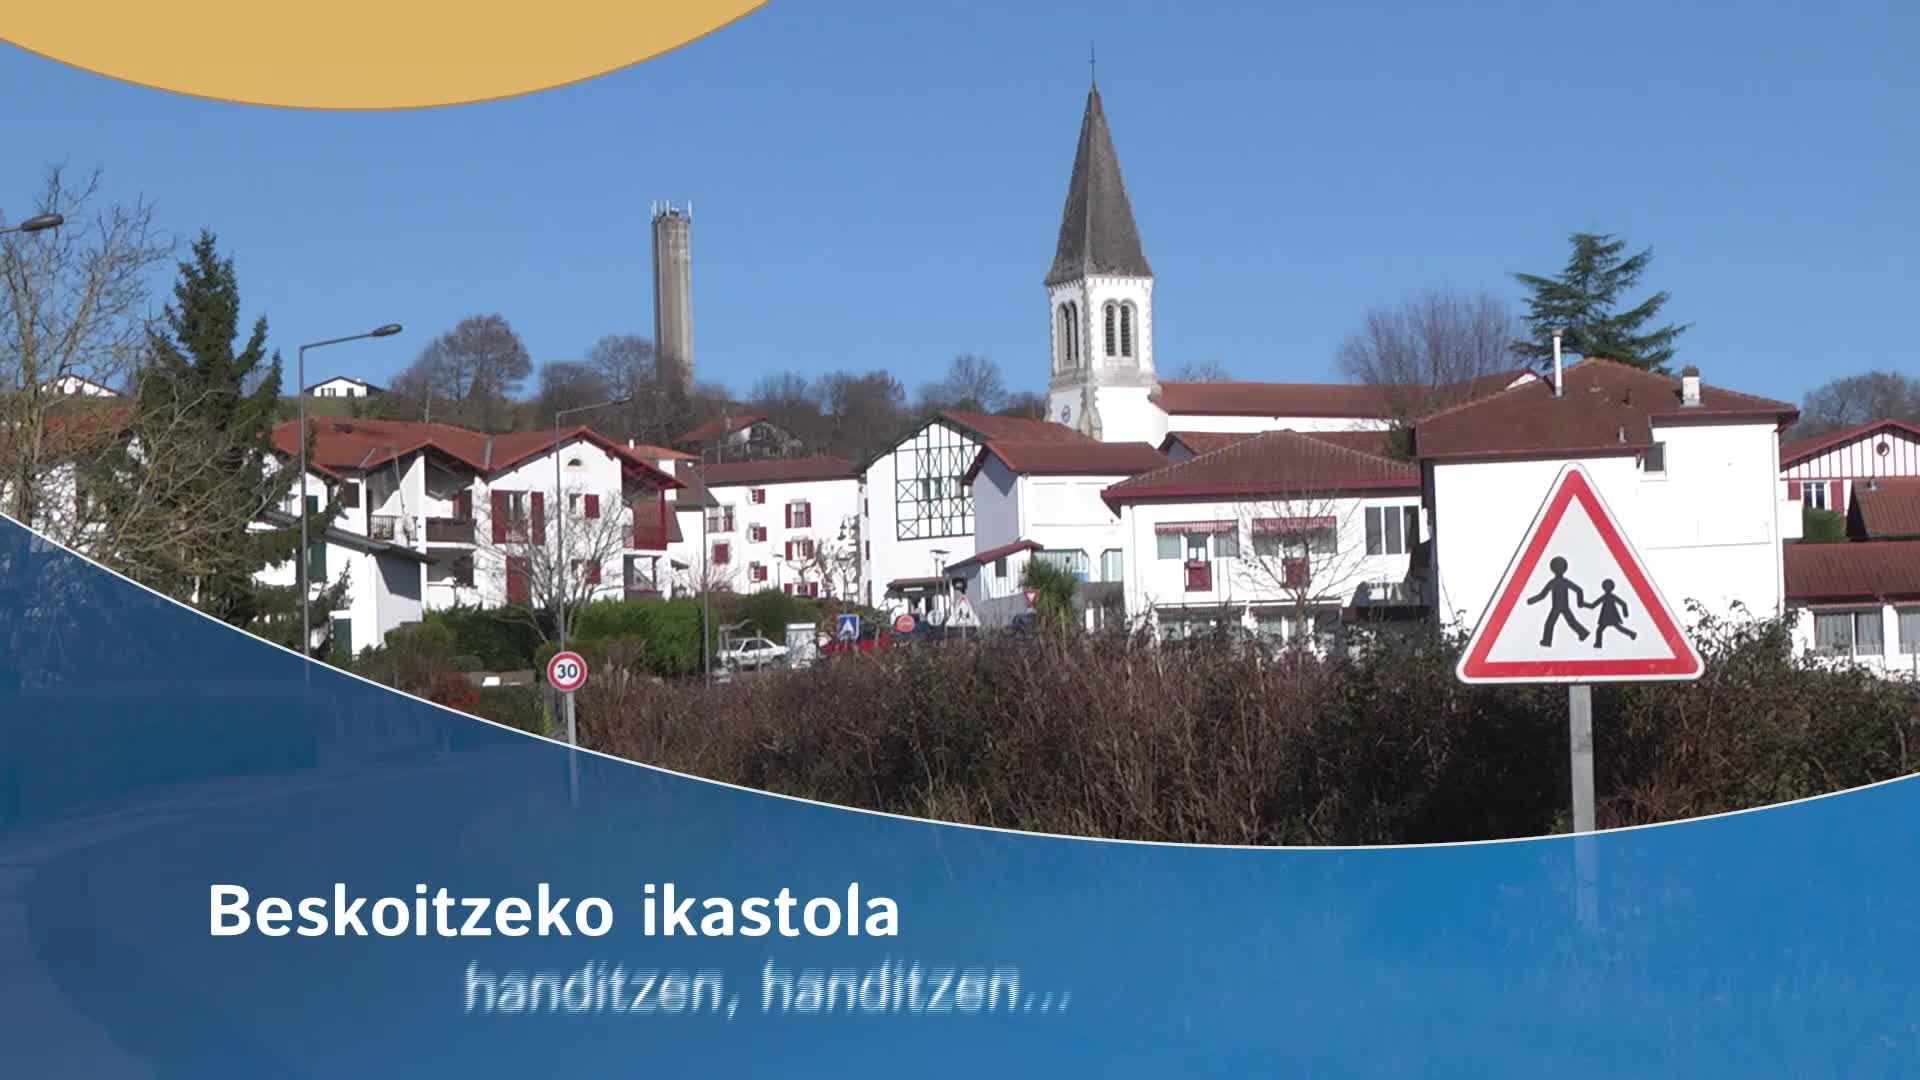 Beskoitzeko ikastola: handitzen, handitzen...